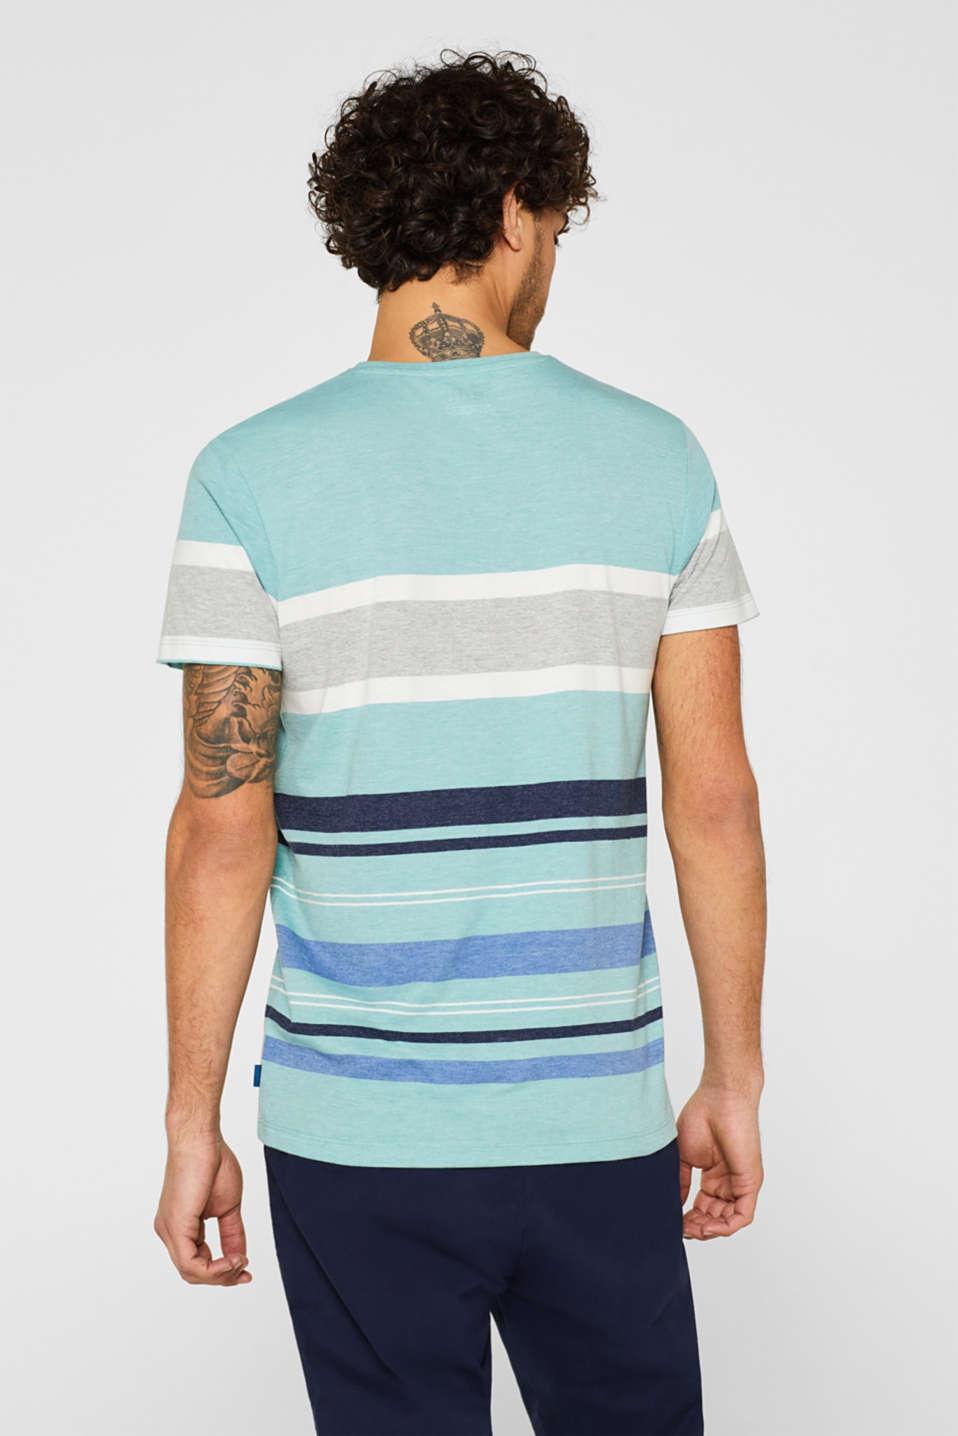 Striped jersey T-shirt, LIGHT AQUA GREEN, detail image number 3